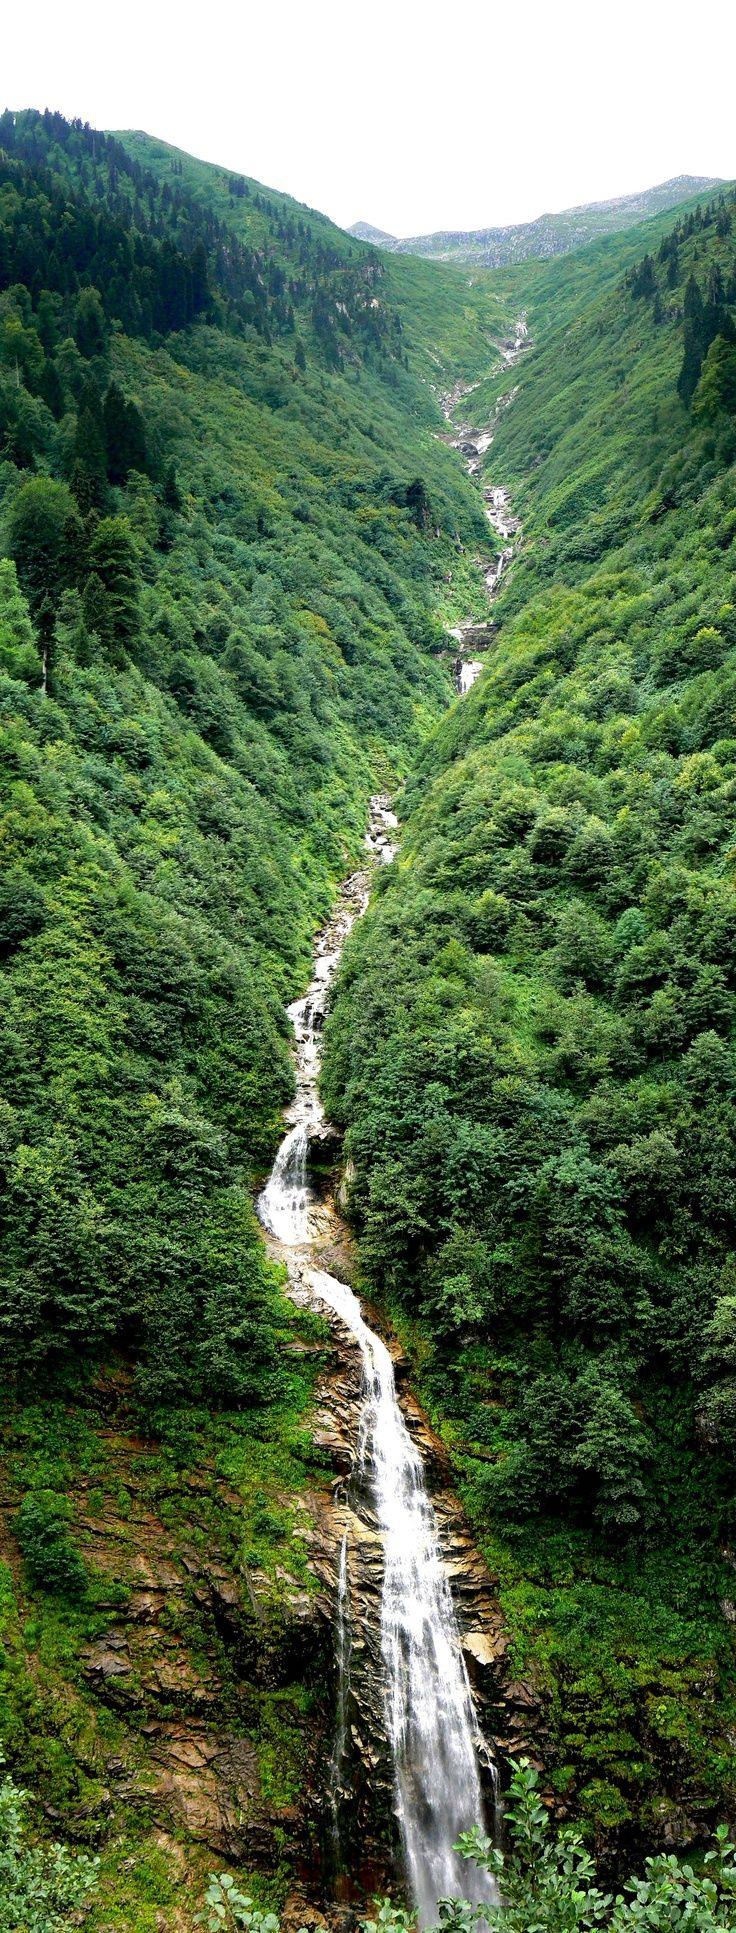 Ayder is a yayla (summer resort) in Rize Province, Turkey